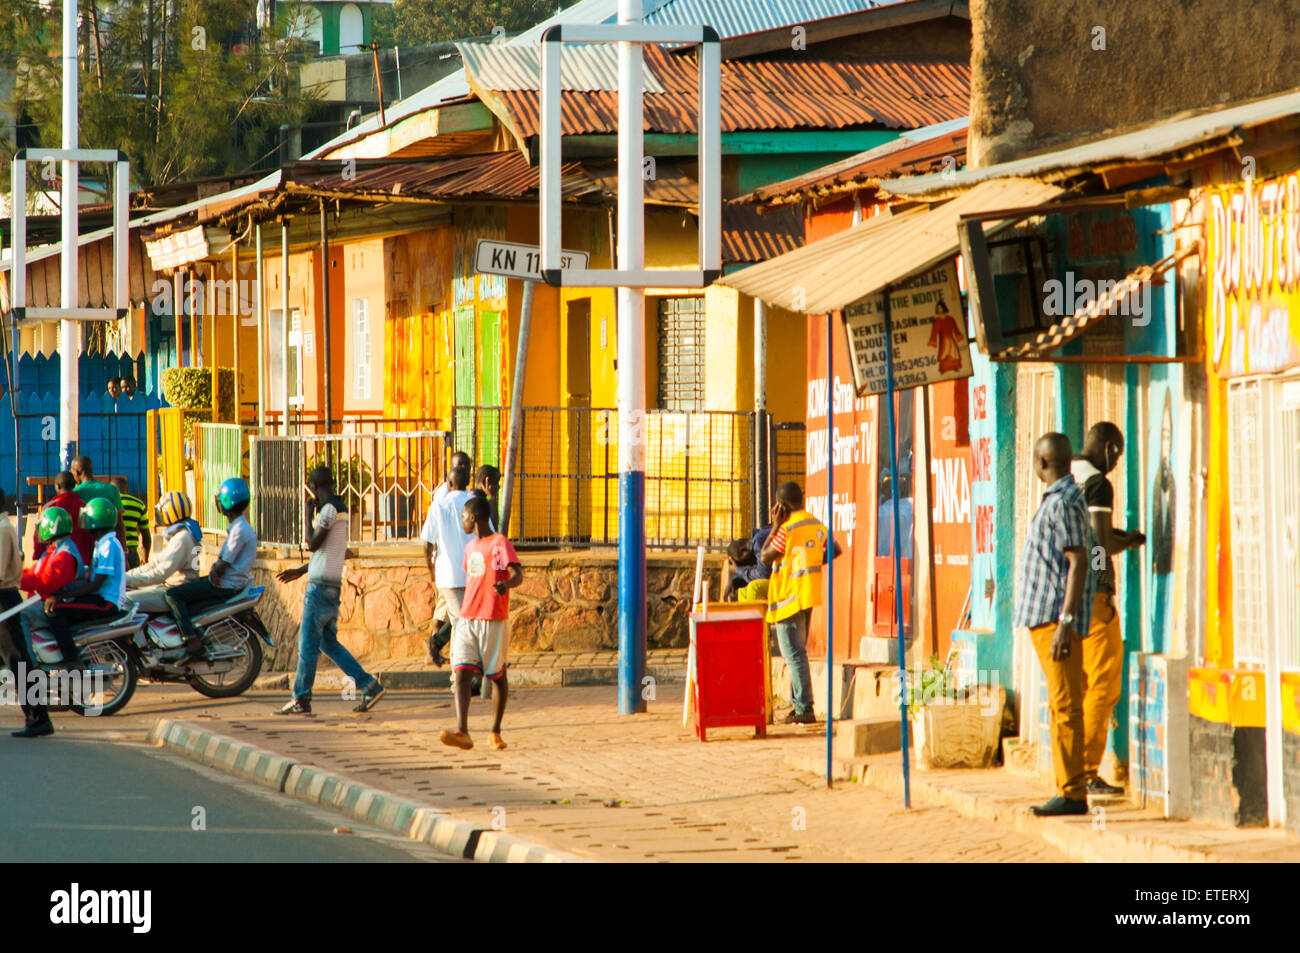 Street scene with brightly painted shops, Nyamirambo, Kigali, Rwanda - Stock Image